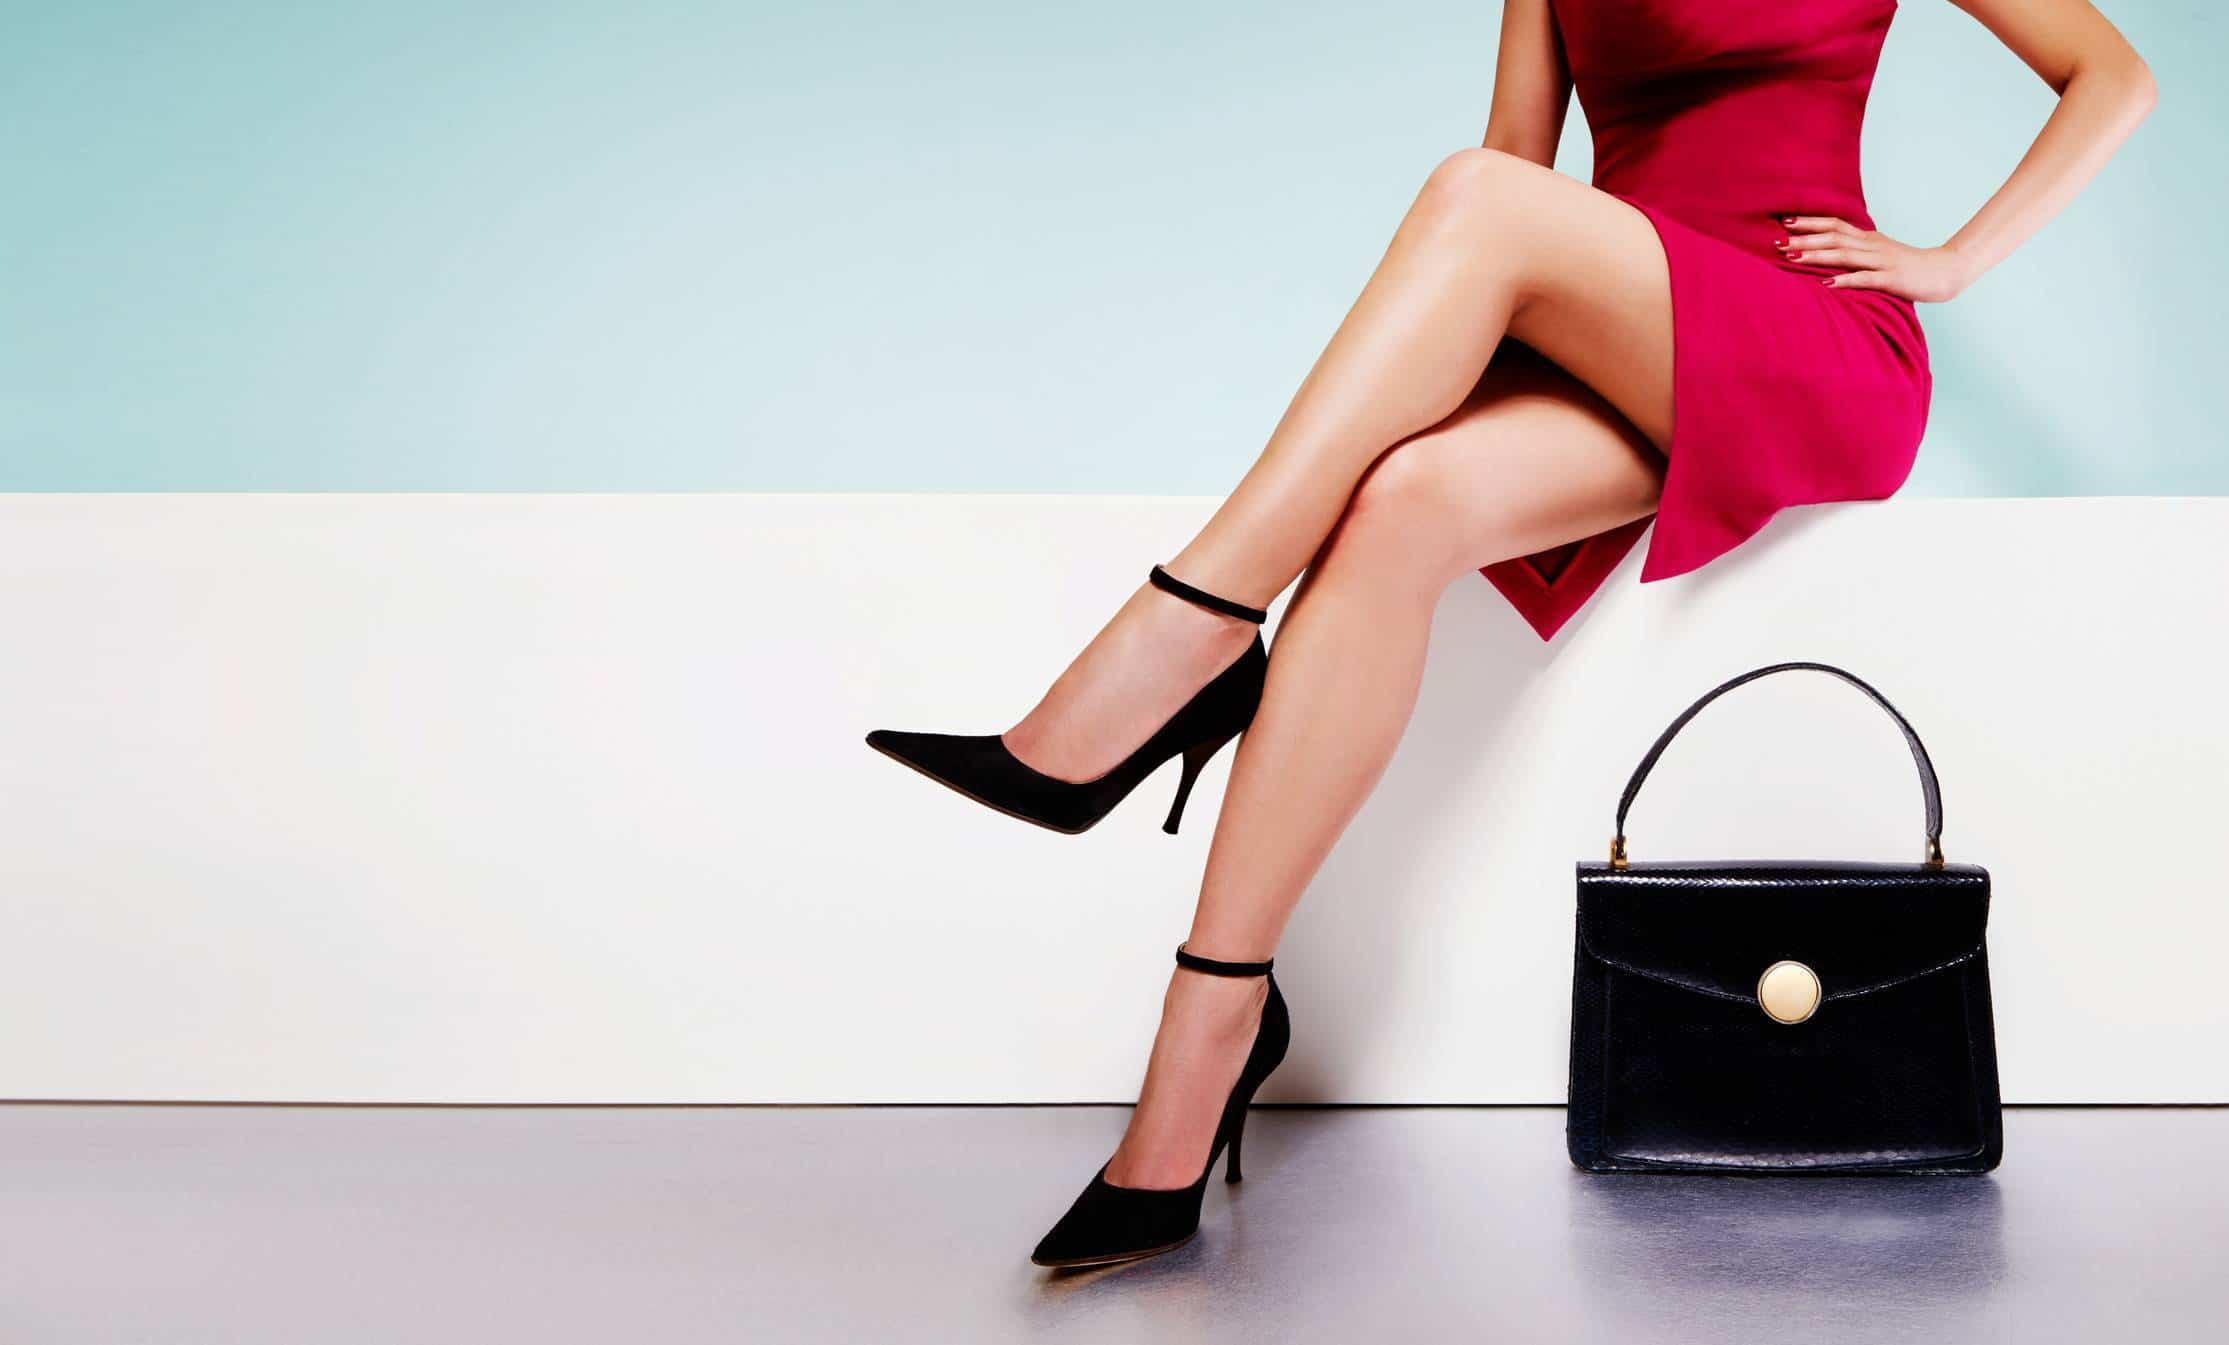 sac de luxe d'occasion